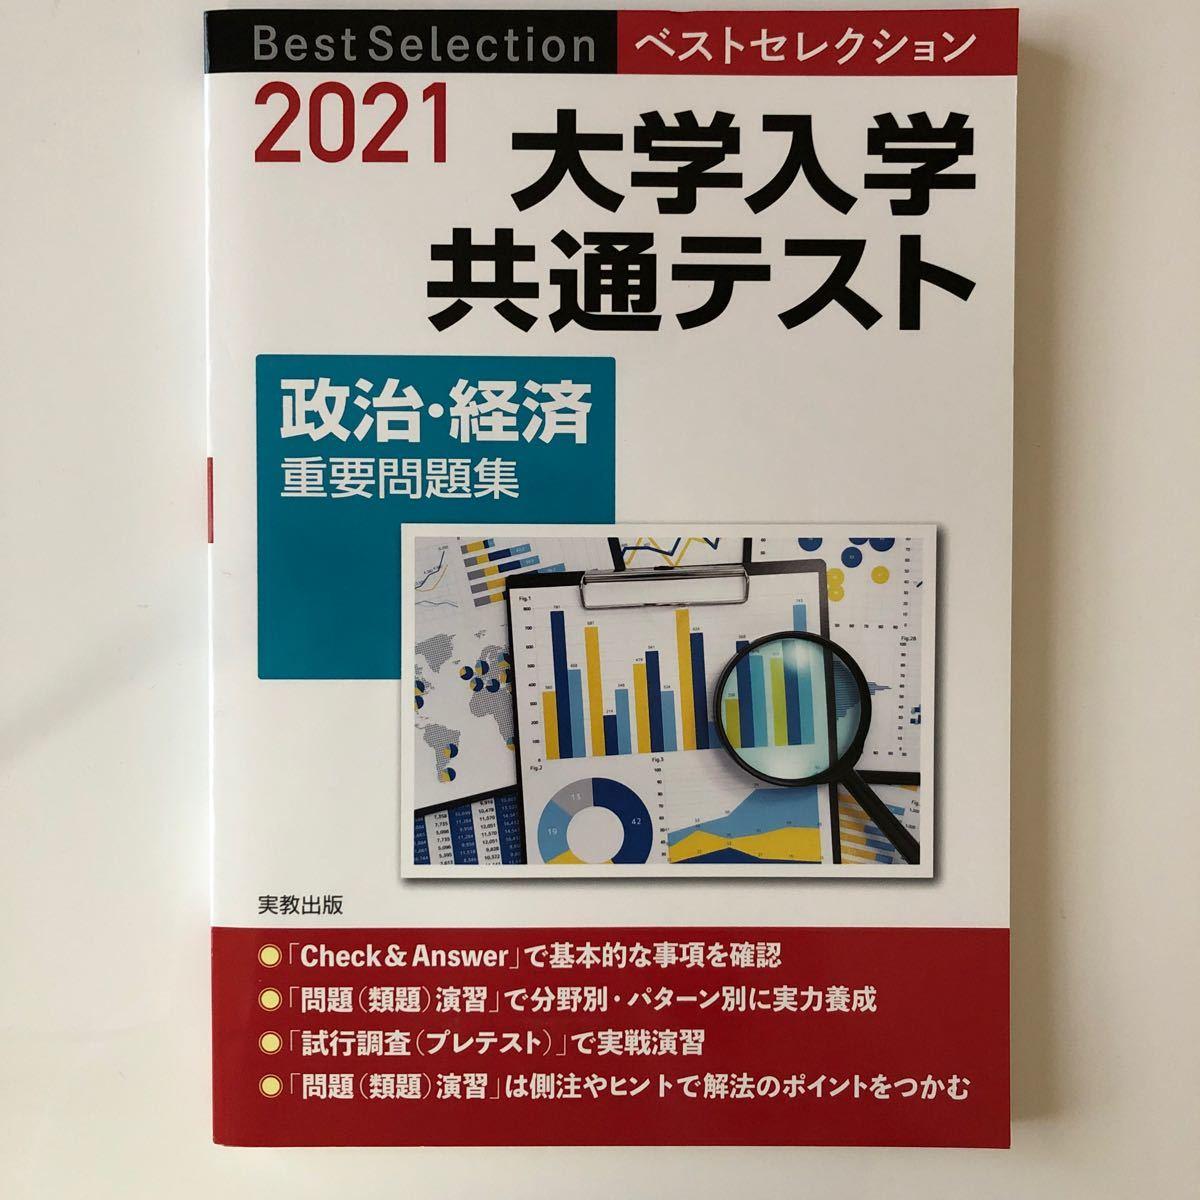 大学入学共通テスト 政治・経済